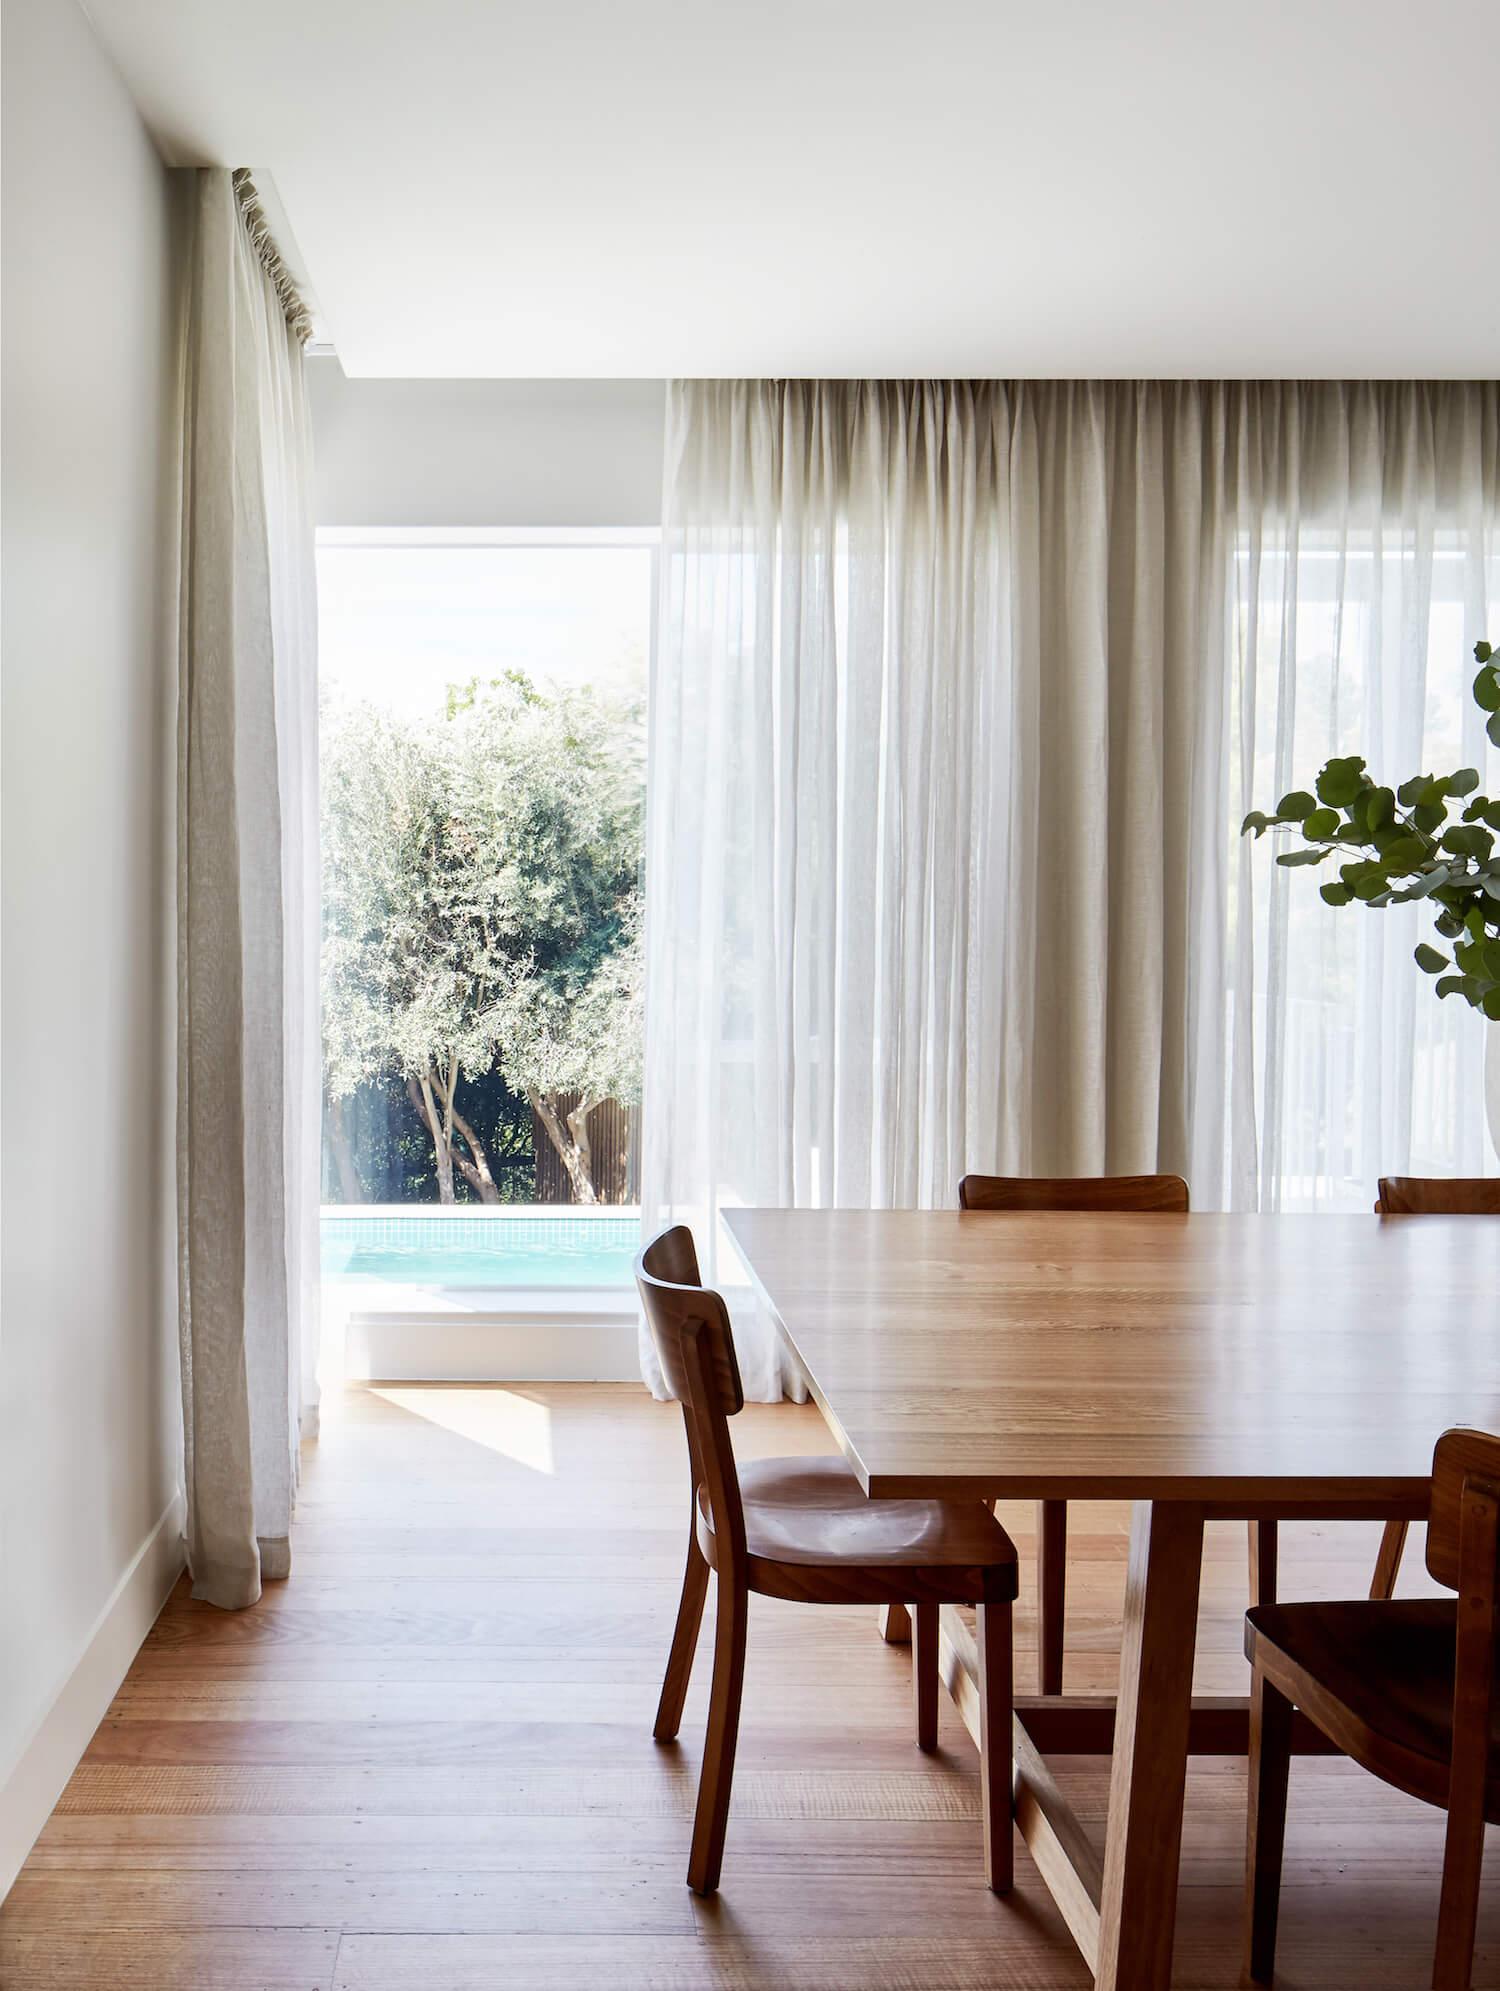 est living australian interiors Architecture Design Holroyd 13 dining